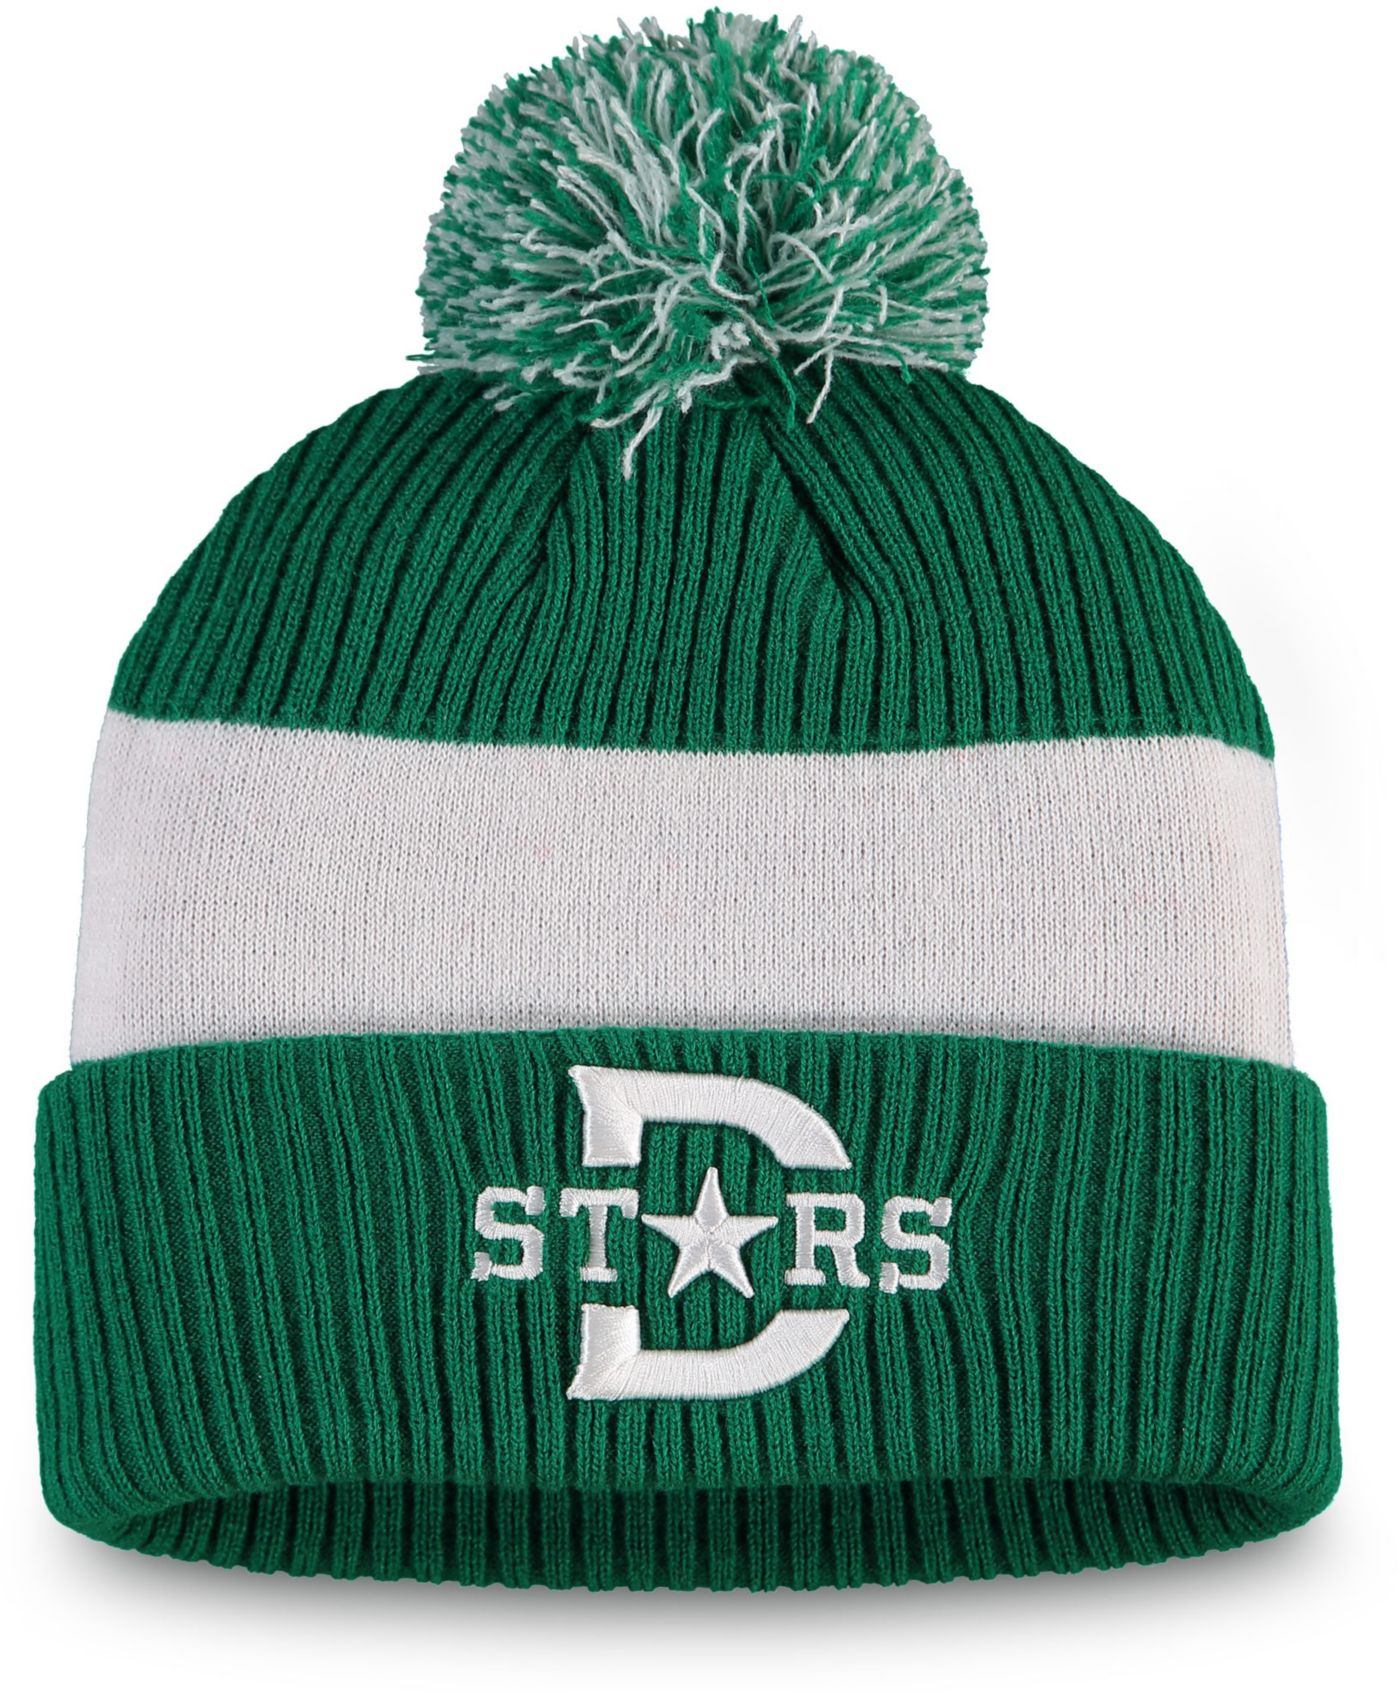 NHL Men's 2020 Winter Classic Dallas Stars Team Pom Knit Beanie